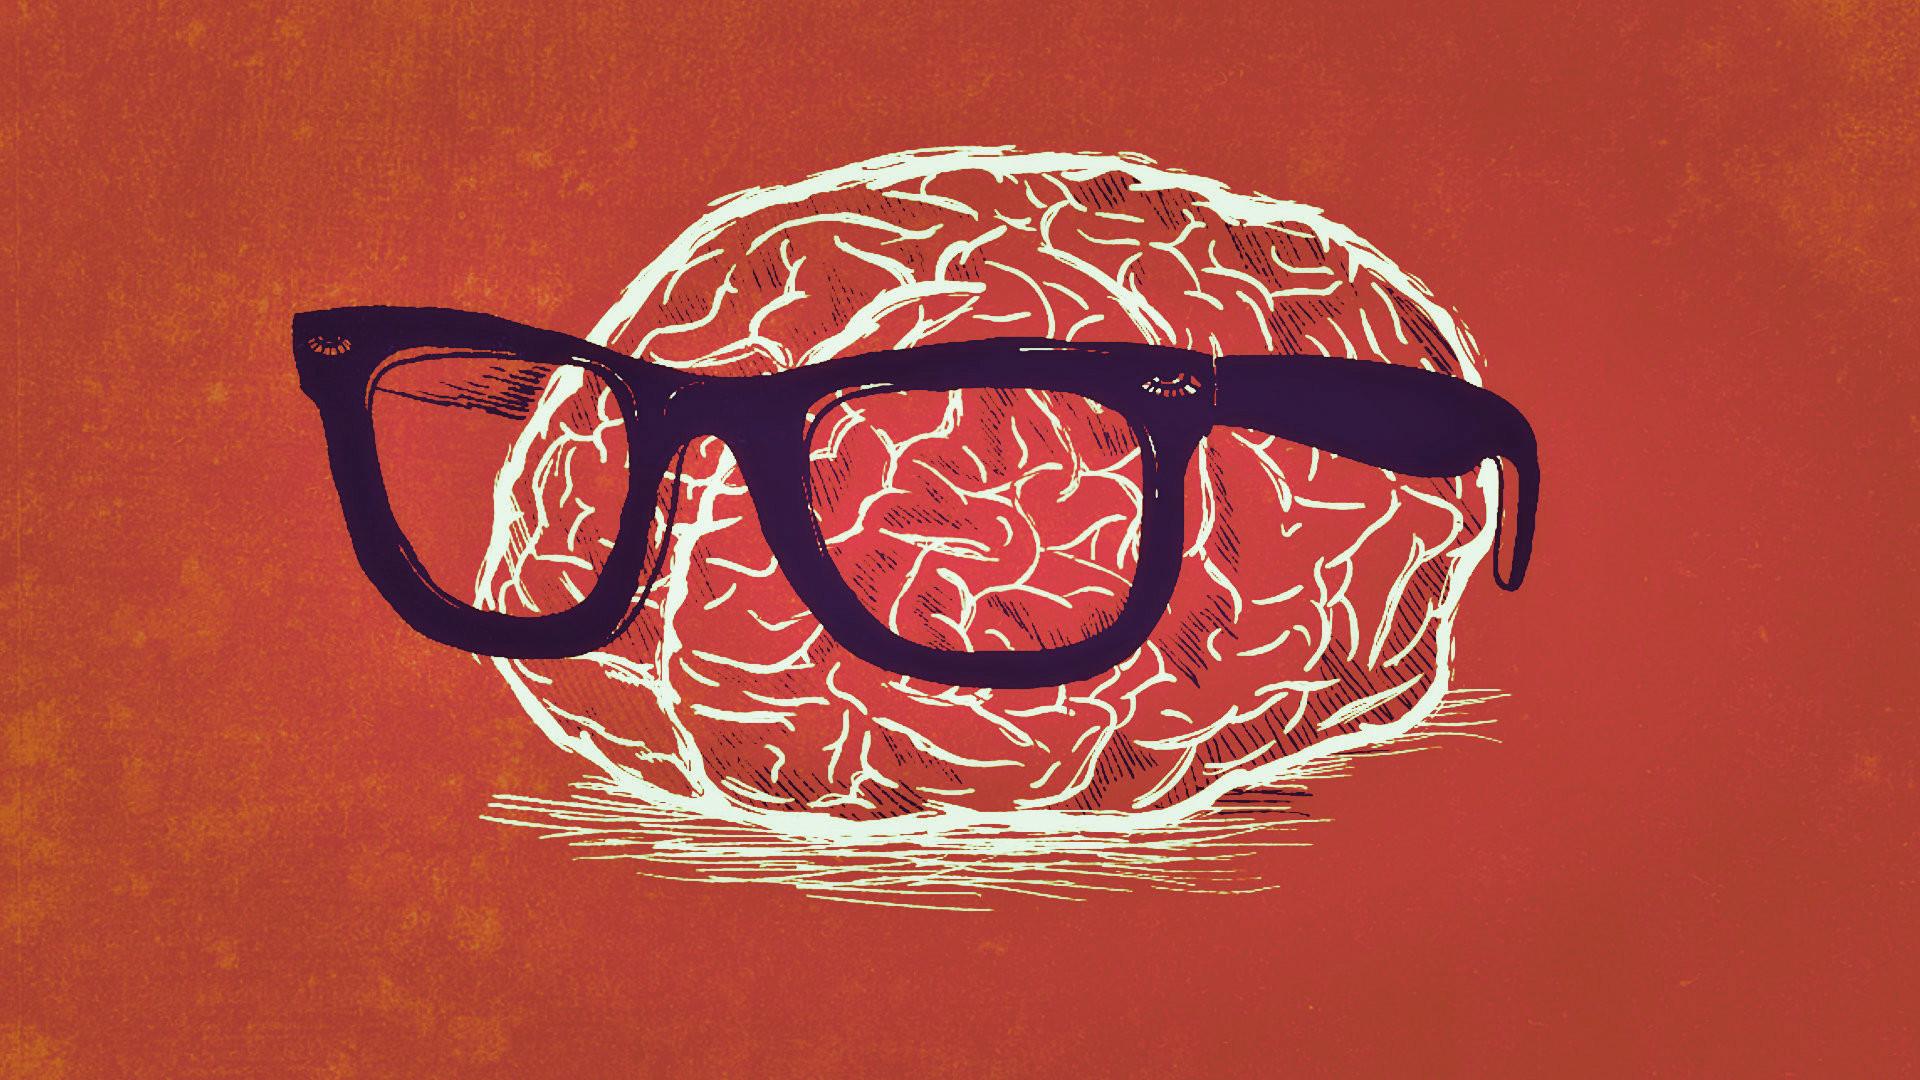 Humor – Nerd Orange Brain Weird Wallpaper